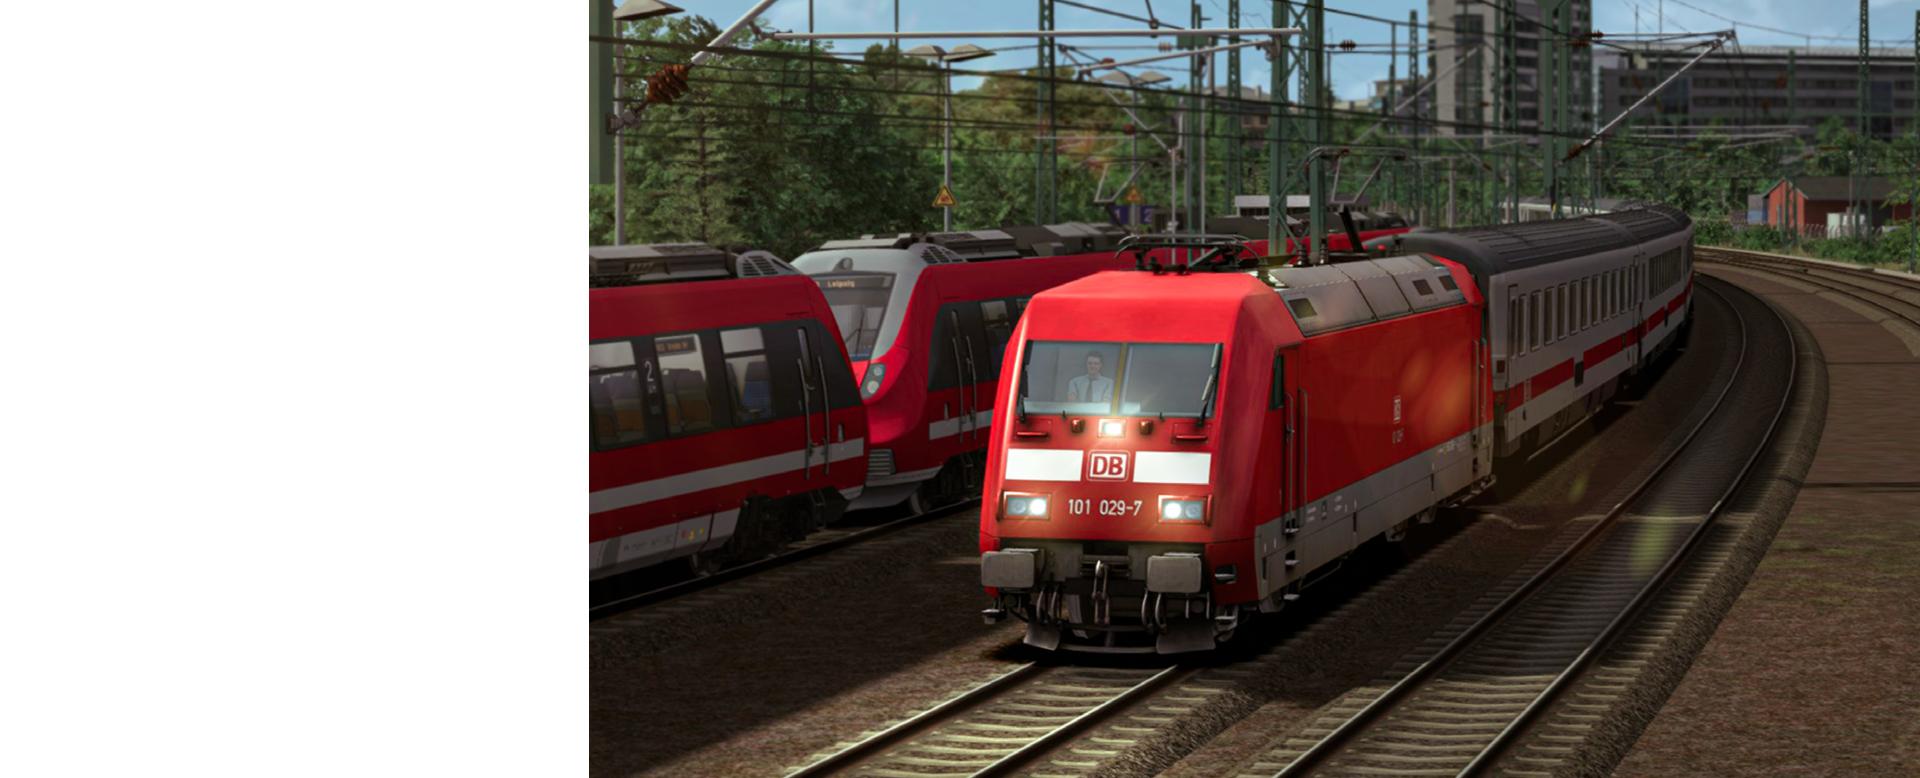 Bahnstrecke Riesa - Dresden